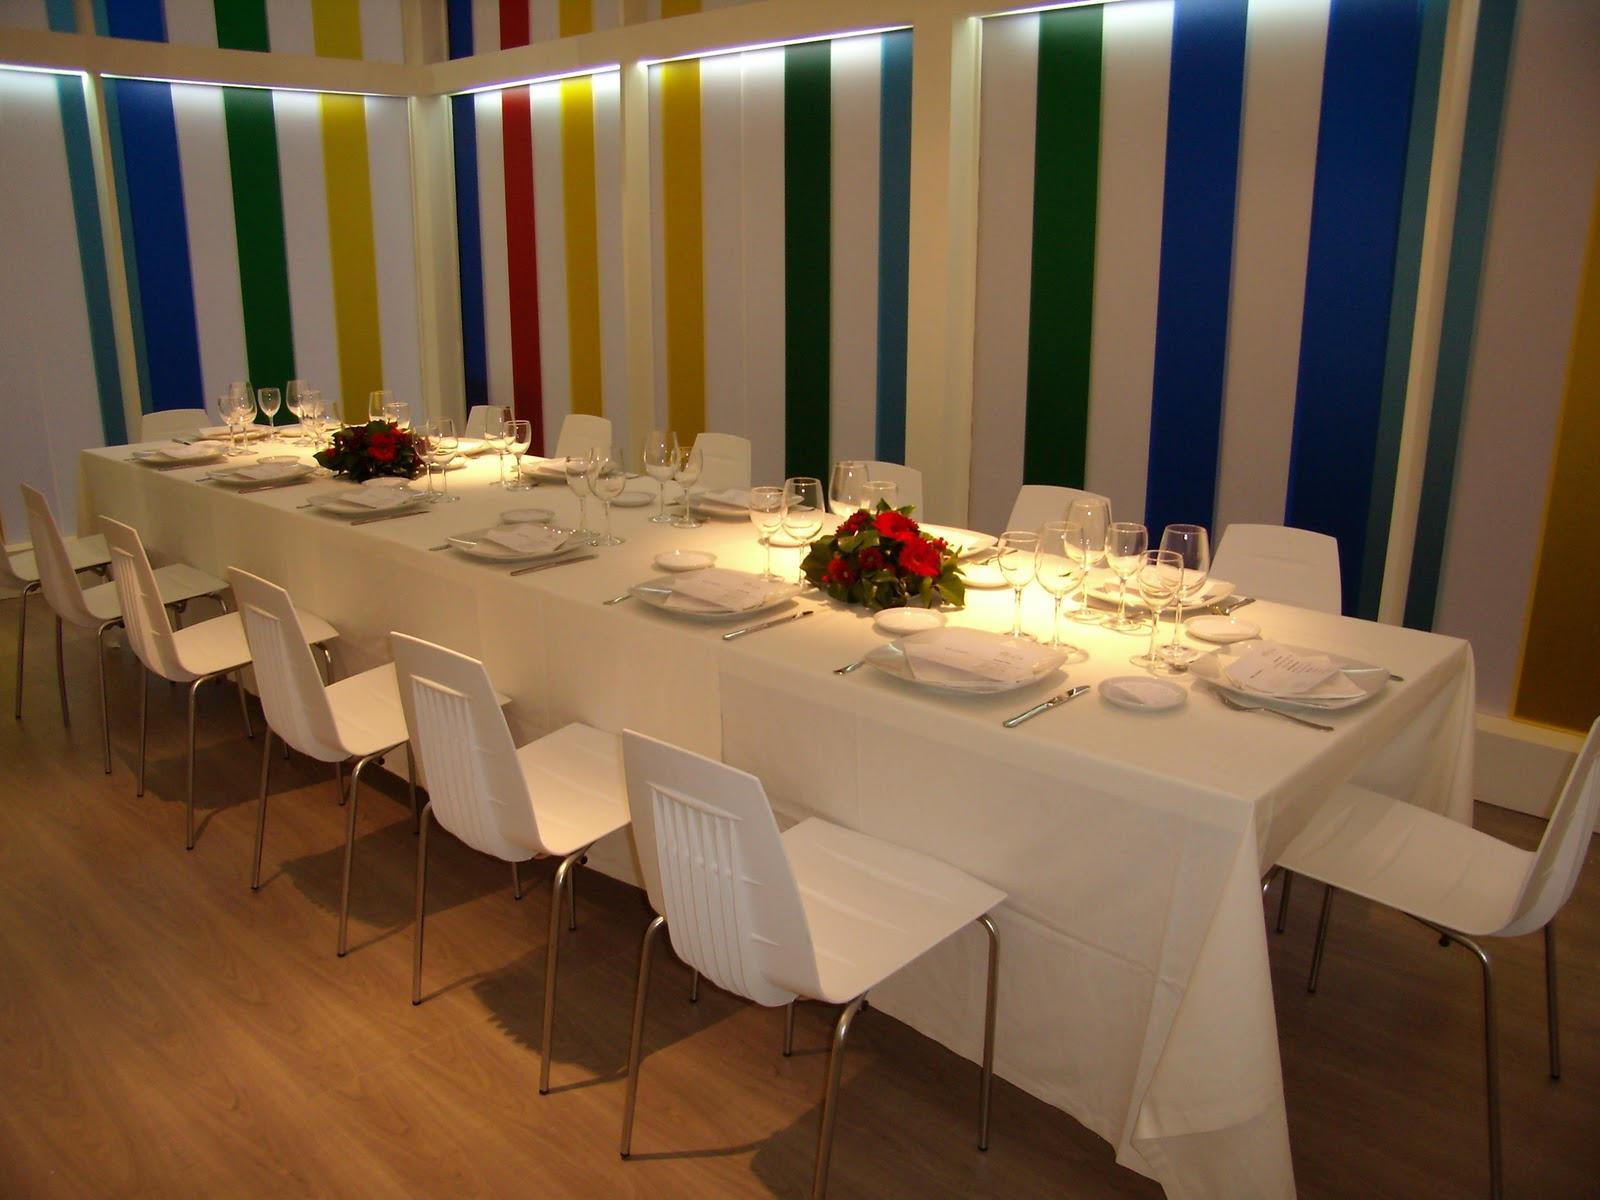 banquetes hosteler a blog de michel delgado mart nez banquetes ii mise en place. Black Bedroom Furniture Sets. Home Design Ideas